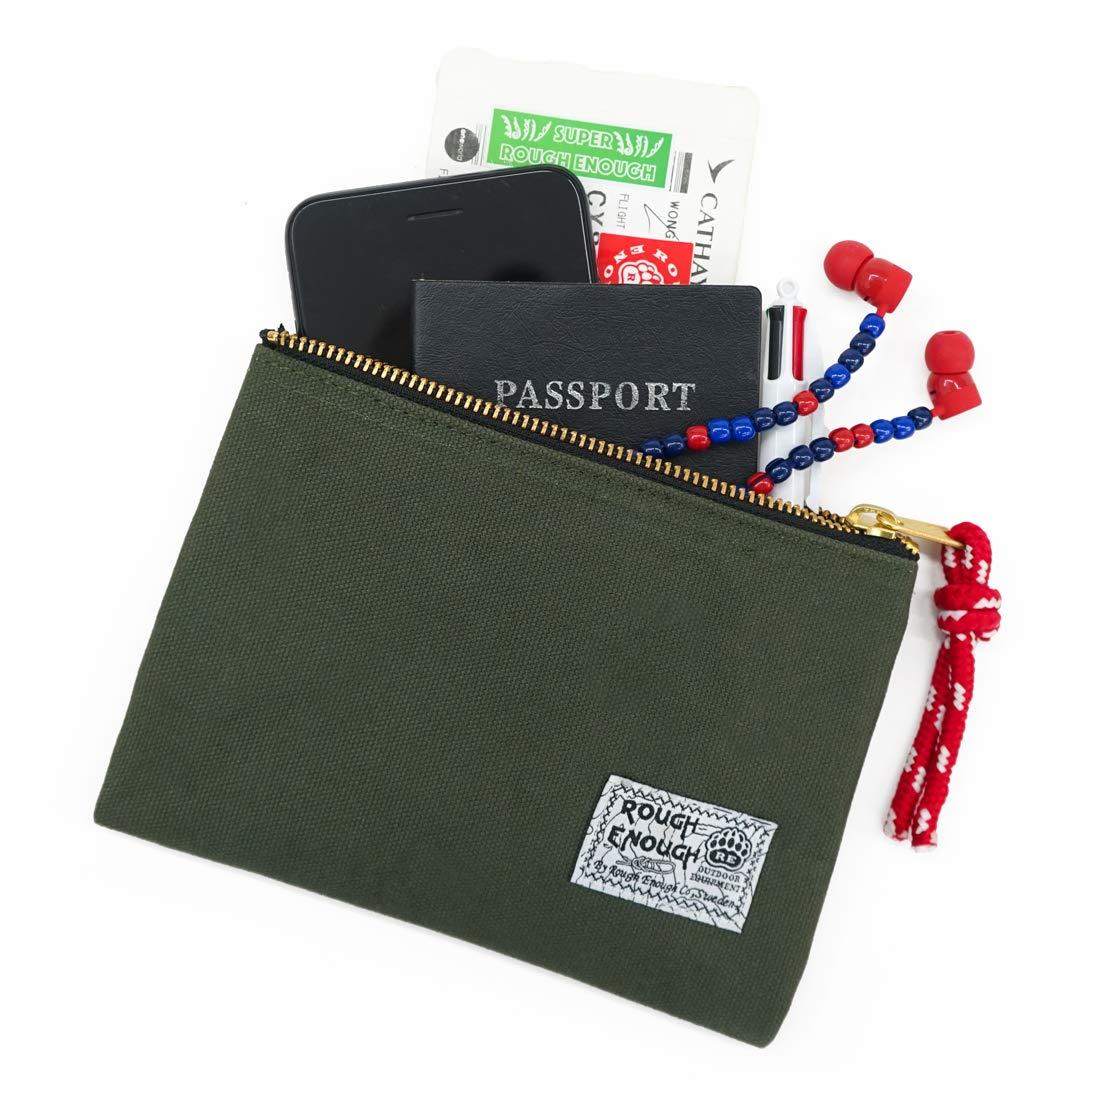 Rough Enough Canvas Travel EDC Pouch Pocket Organizer Bag for Men Women Teen Boy Girl Kids Cell Phone Pen Case Holder with Zipper for School Car Accessories Travel Gear Essential Wallet